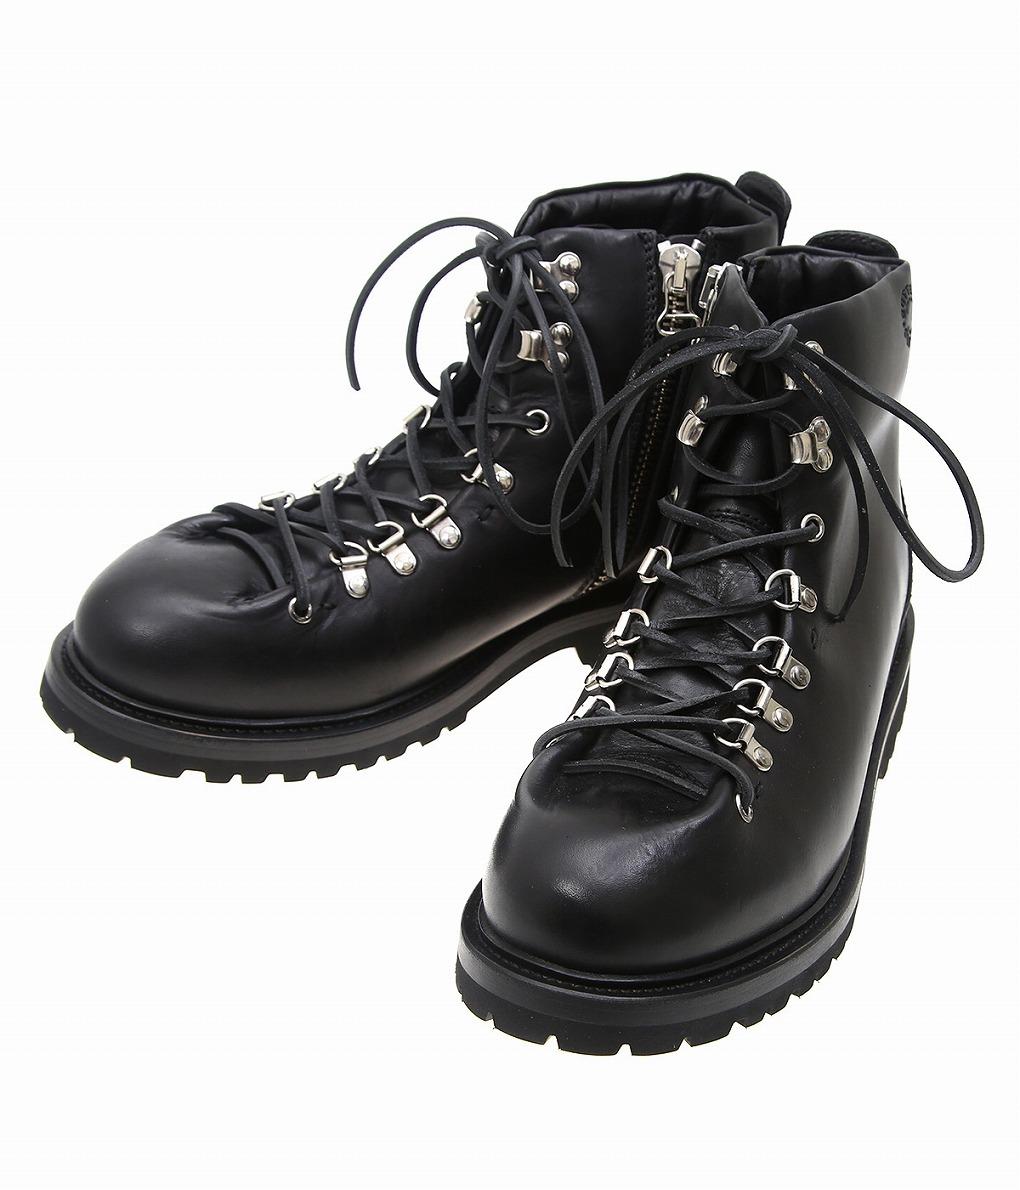 BUTTERO ブッテロ CANALONE TREKKING BOOTS LEATHER トレッキングブーツ マウンテンブーツ レザーブーツ B4950-leather-tosch MUS 古稀祝 新居祝い お買い得